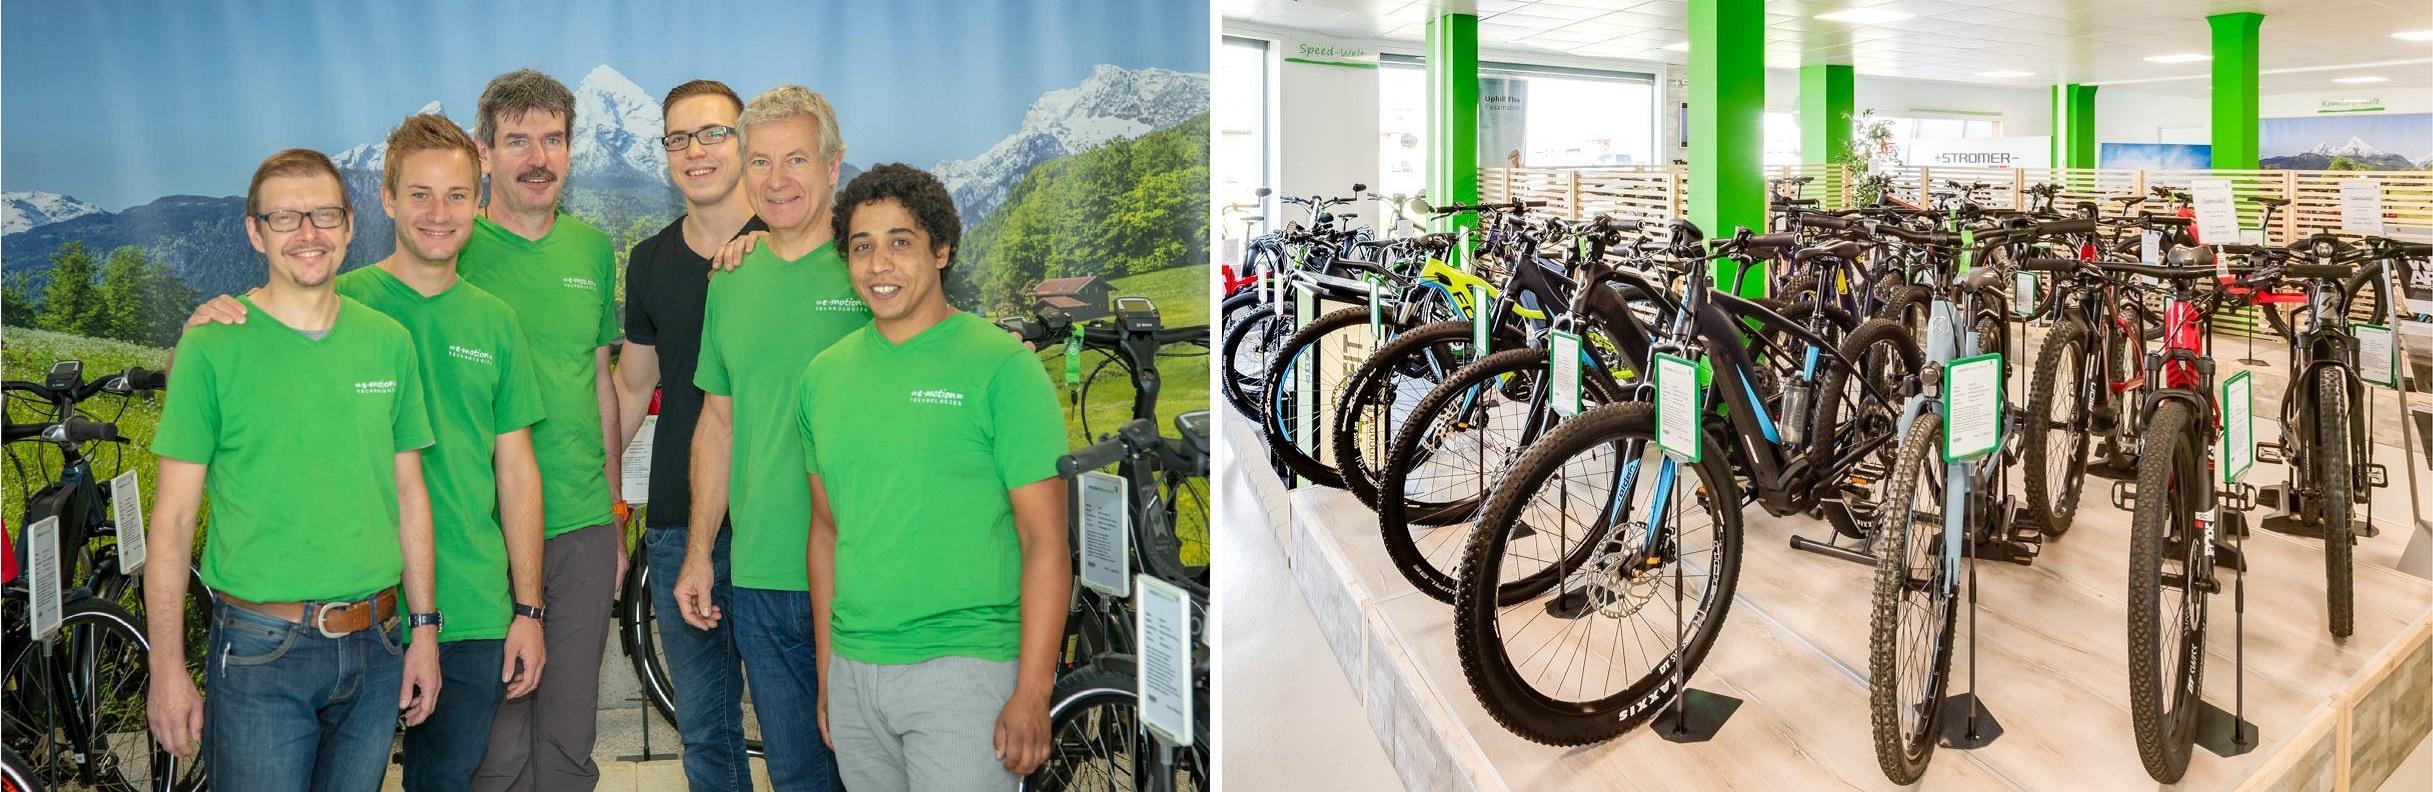 e-motion e-Bike Welt Aarau-Ost